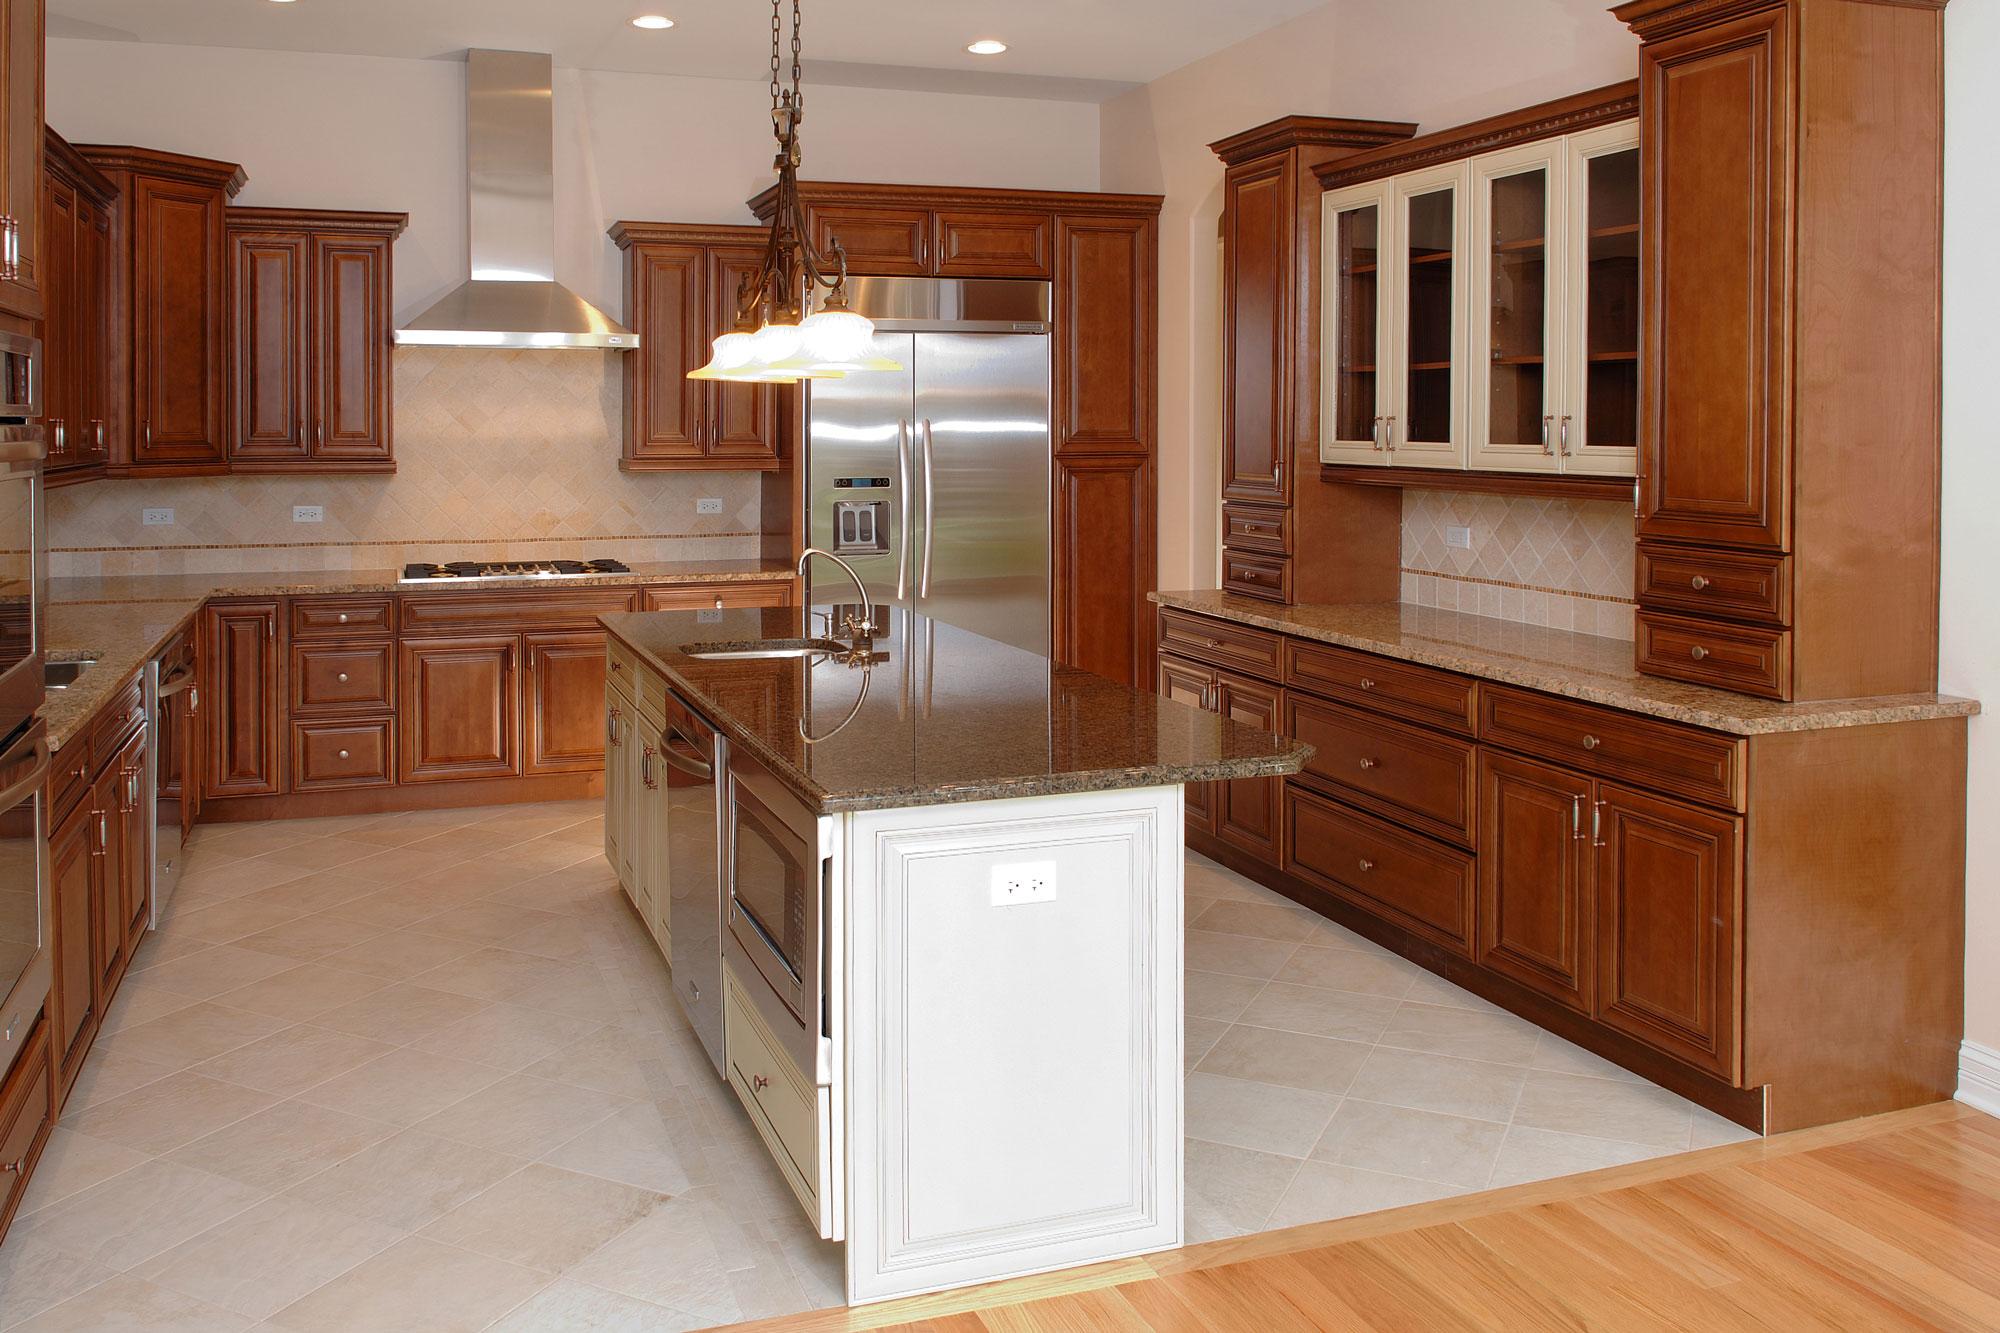 Cabinets - Kitchen & Bath | Kitchen Cabinets & Bathroom ...